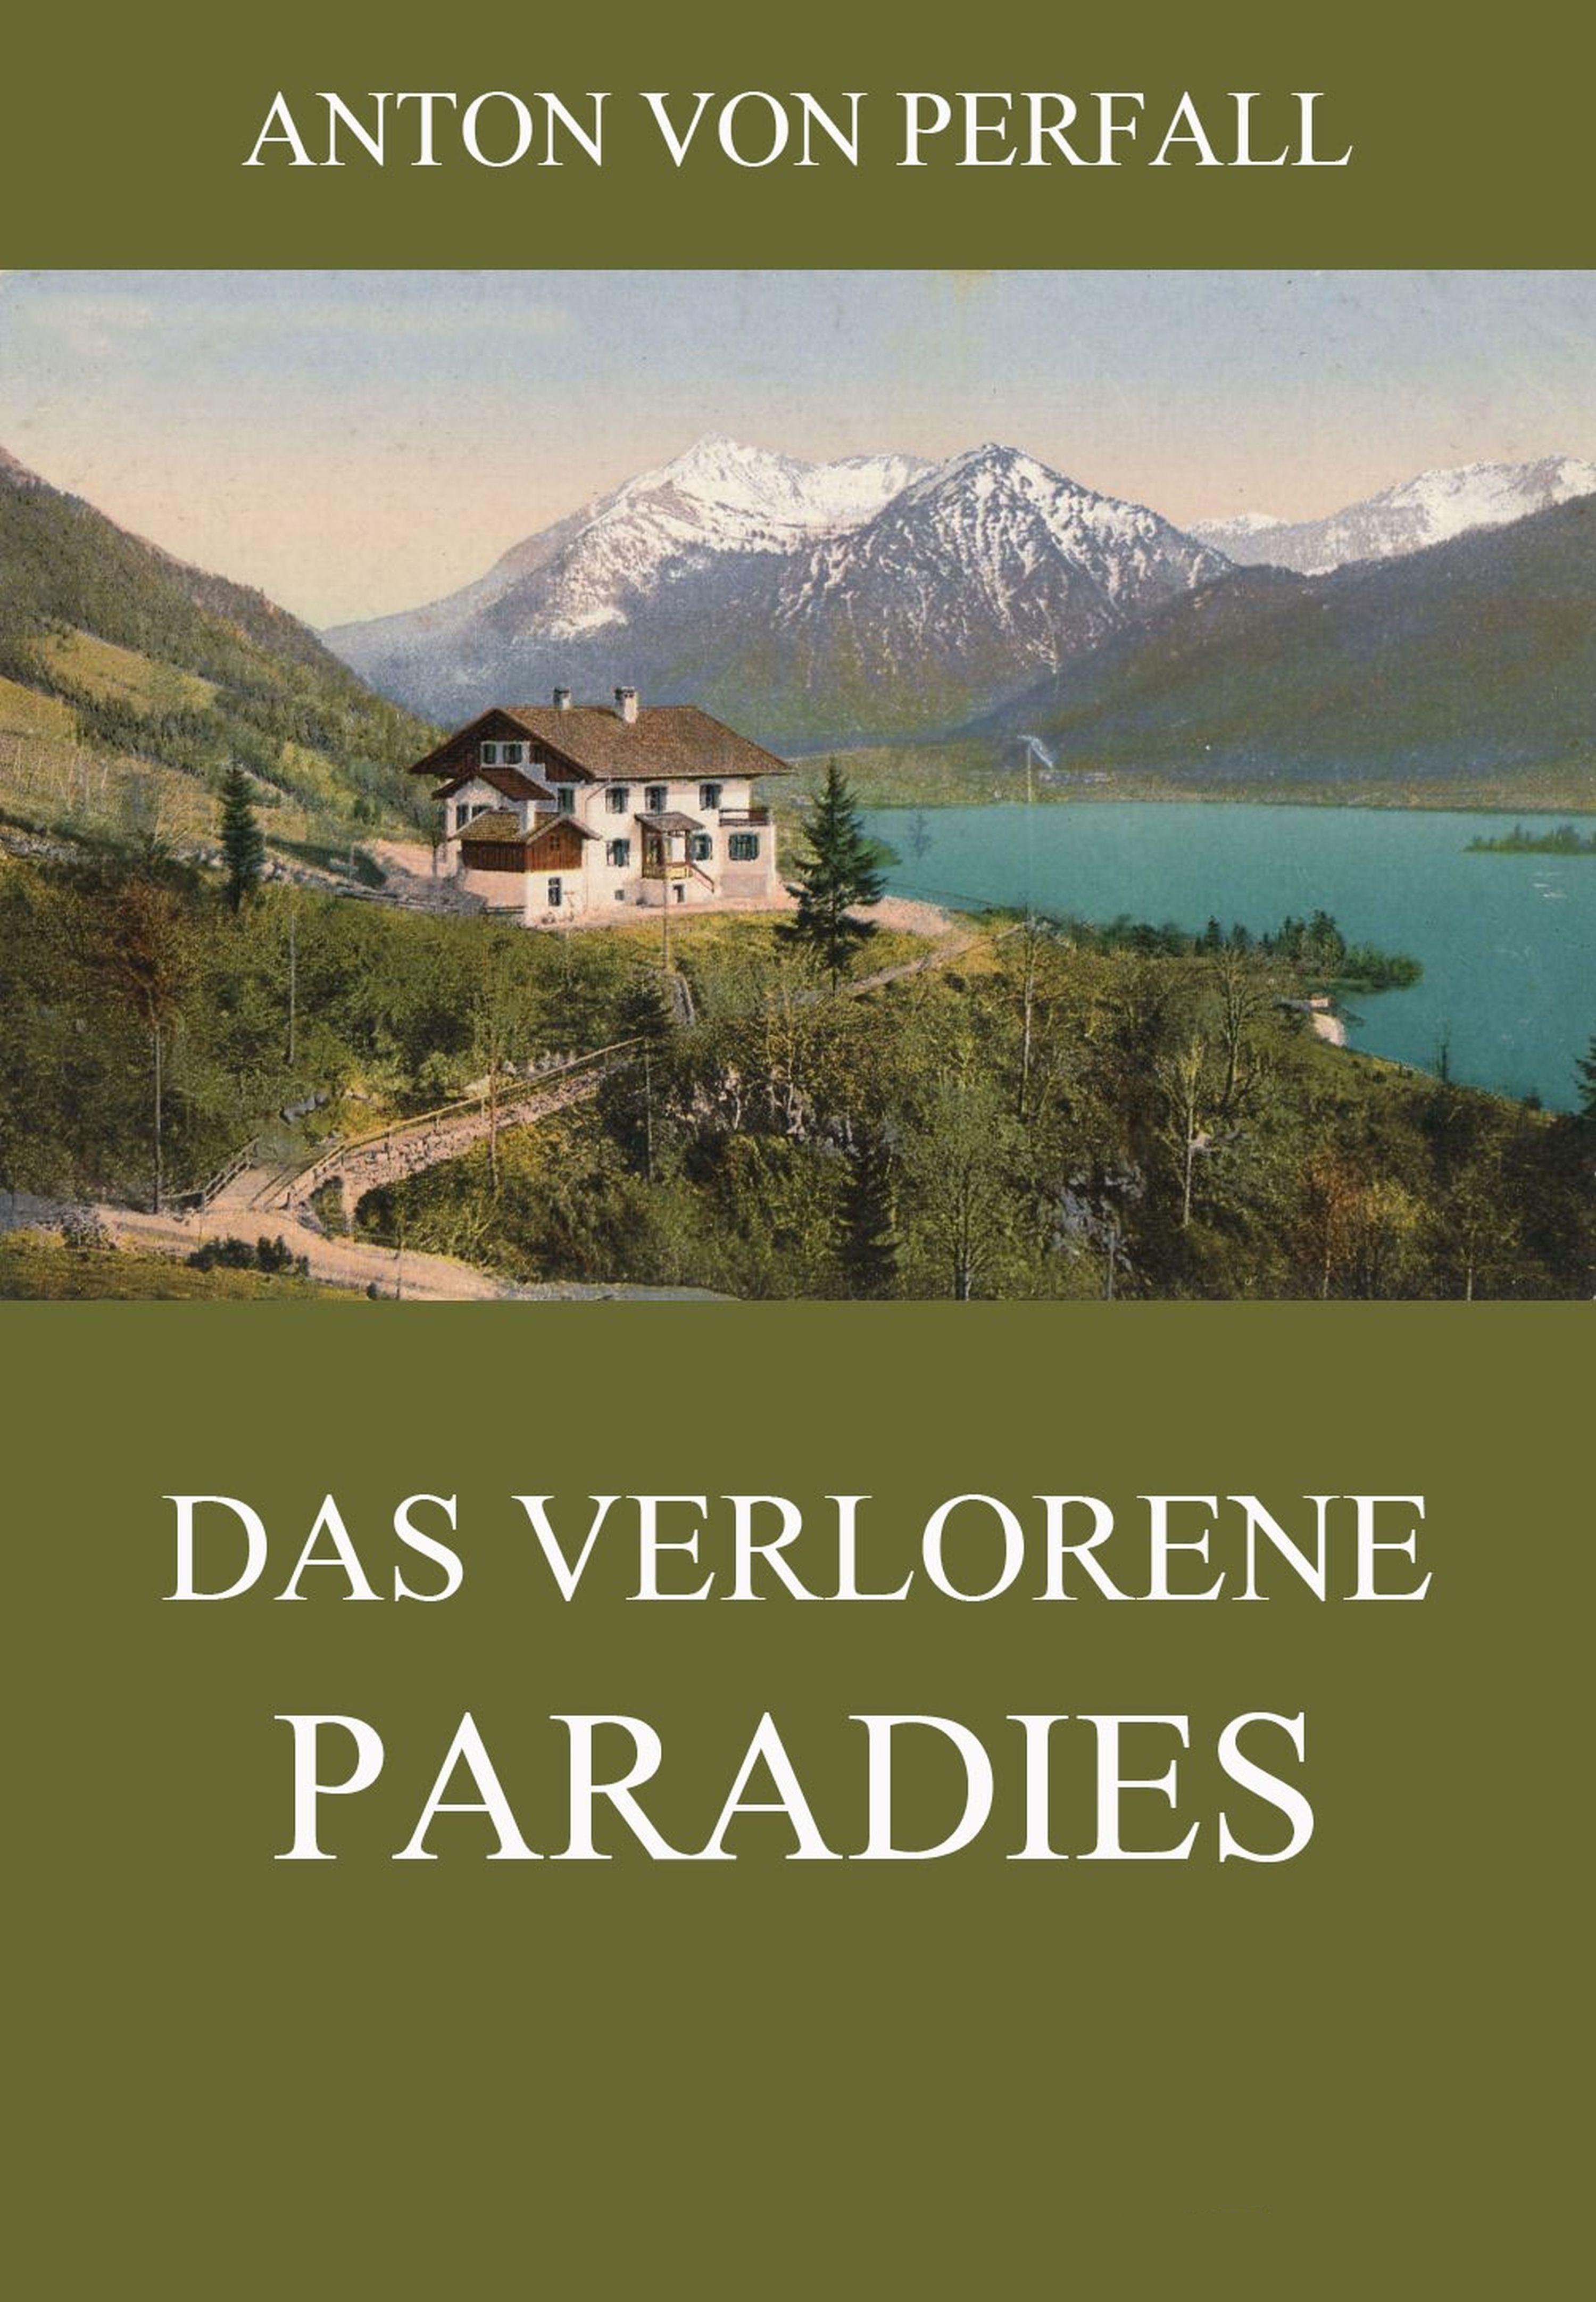 цена Anton von Perfall Das verlorene Paradies онлайн в 2017 году